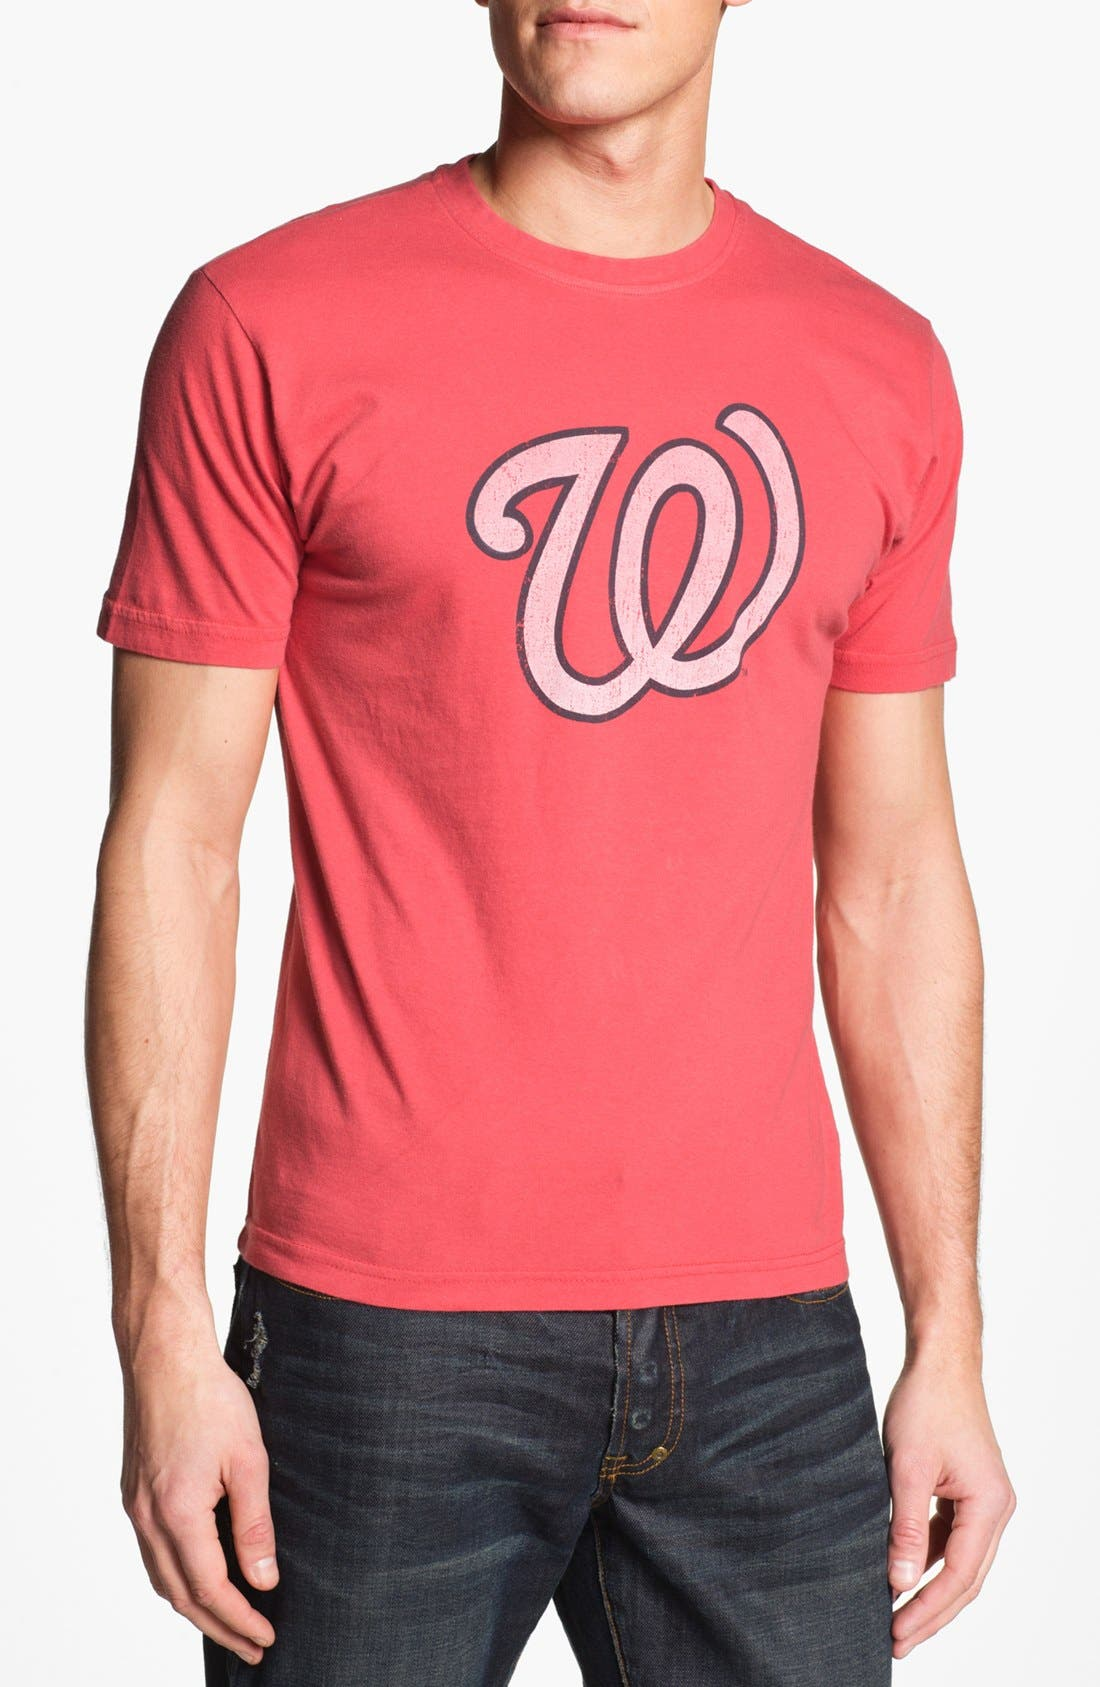 Alternate Image 1 Selected - Red Jacket 'Washington Nationals' Trim Fit T-Shirt (Men)